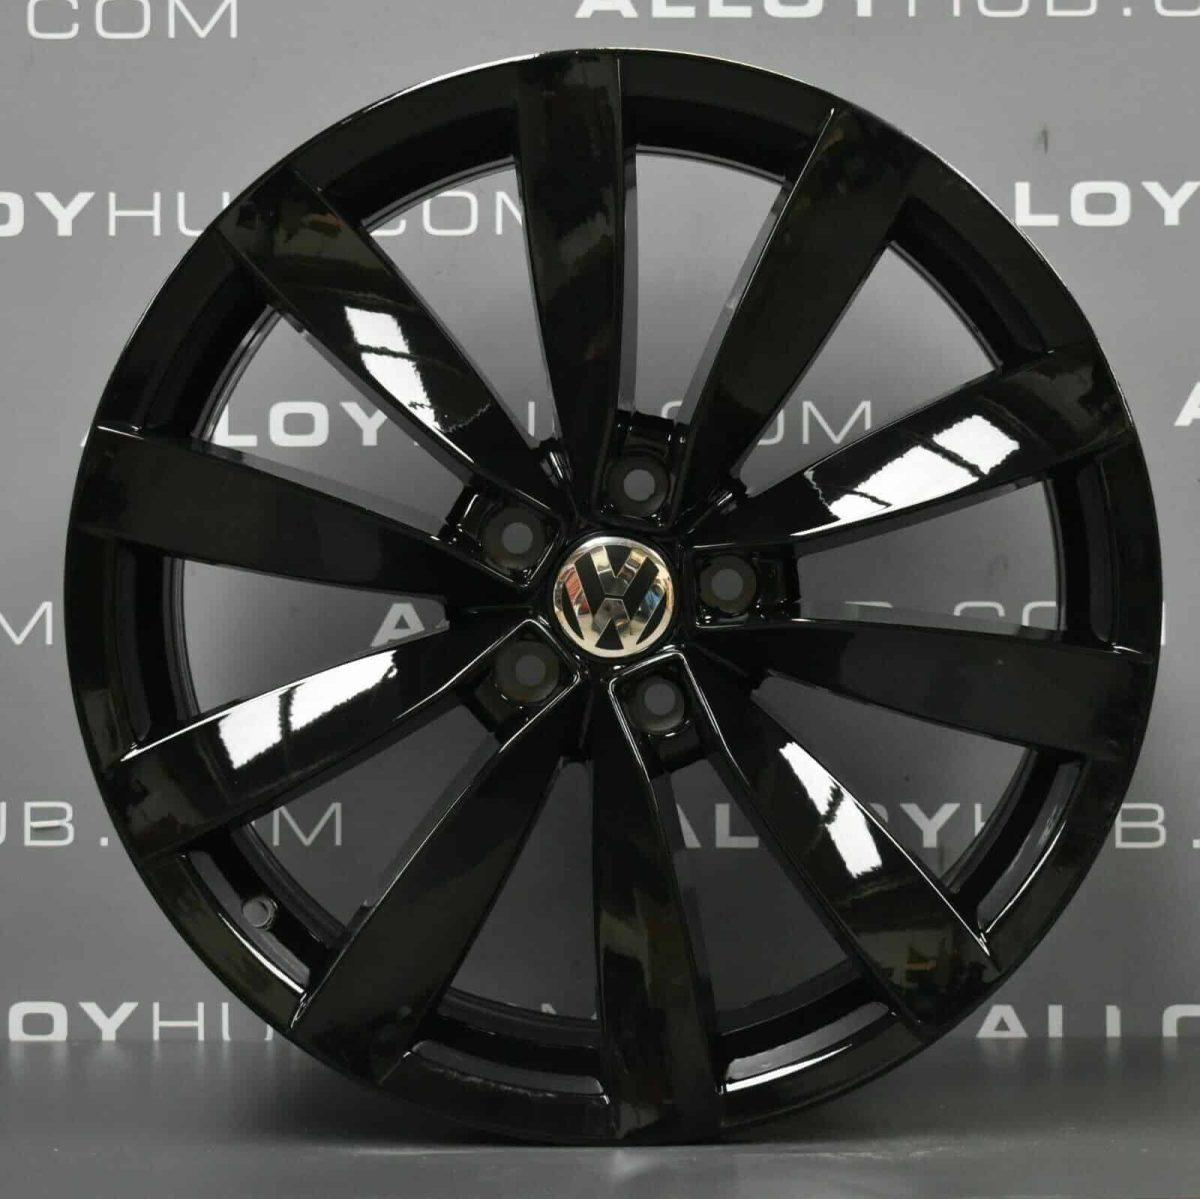 Genuine Volkswagen Scirocco Laguno 19″ inch 10 Spoke Alloy Wheels with Gloss Black Finish 1K8 601 025 S